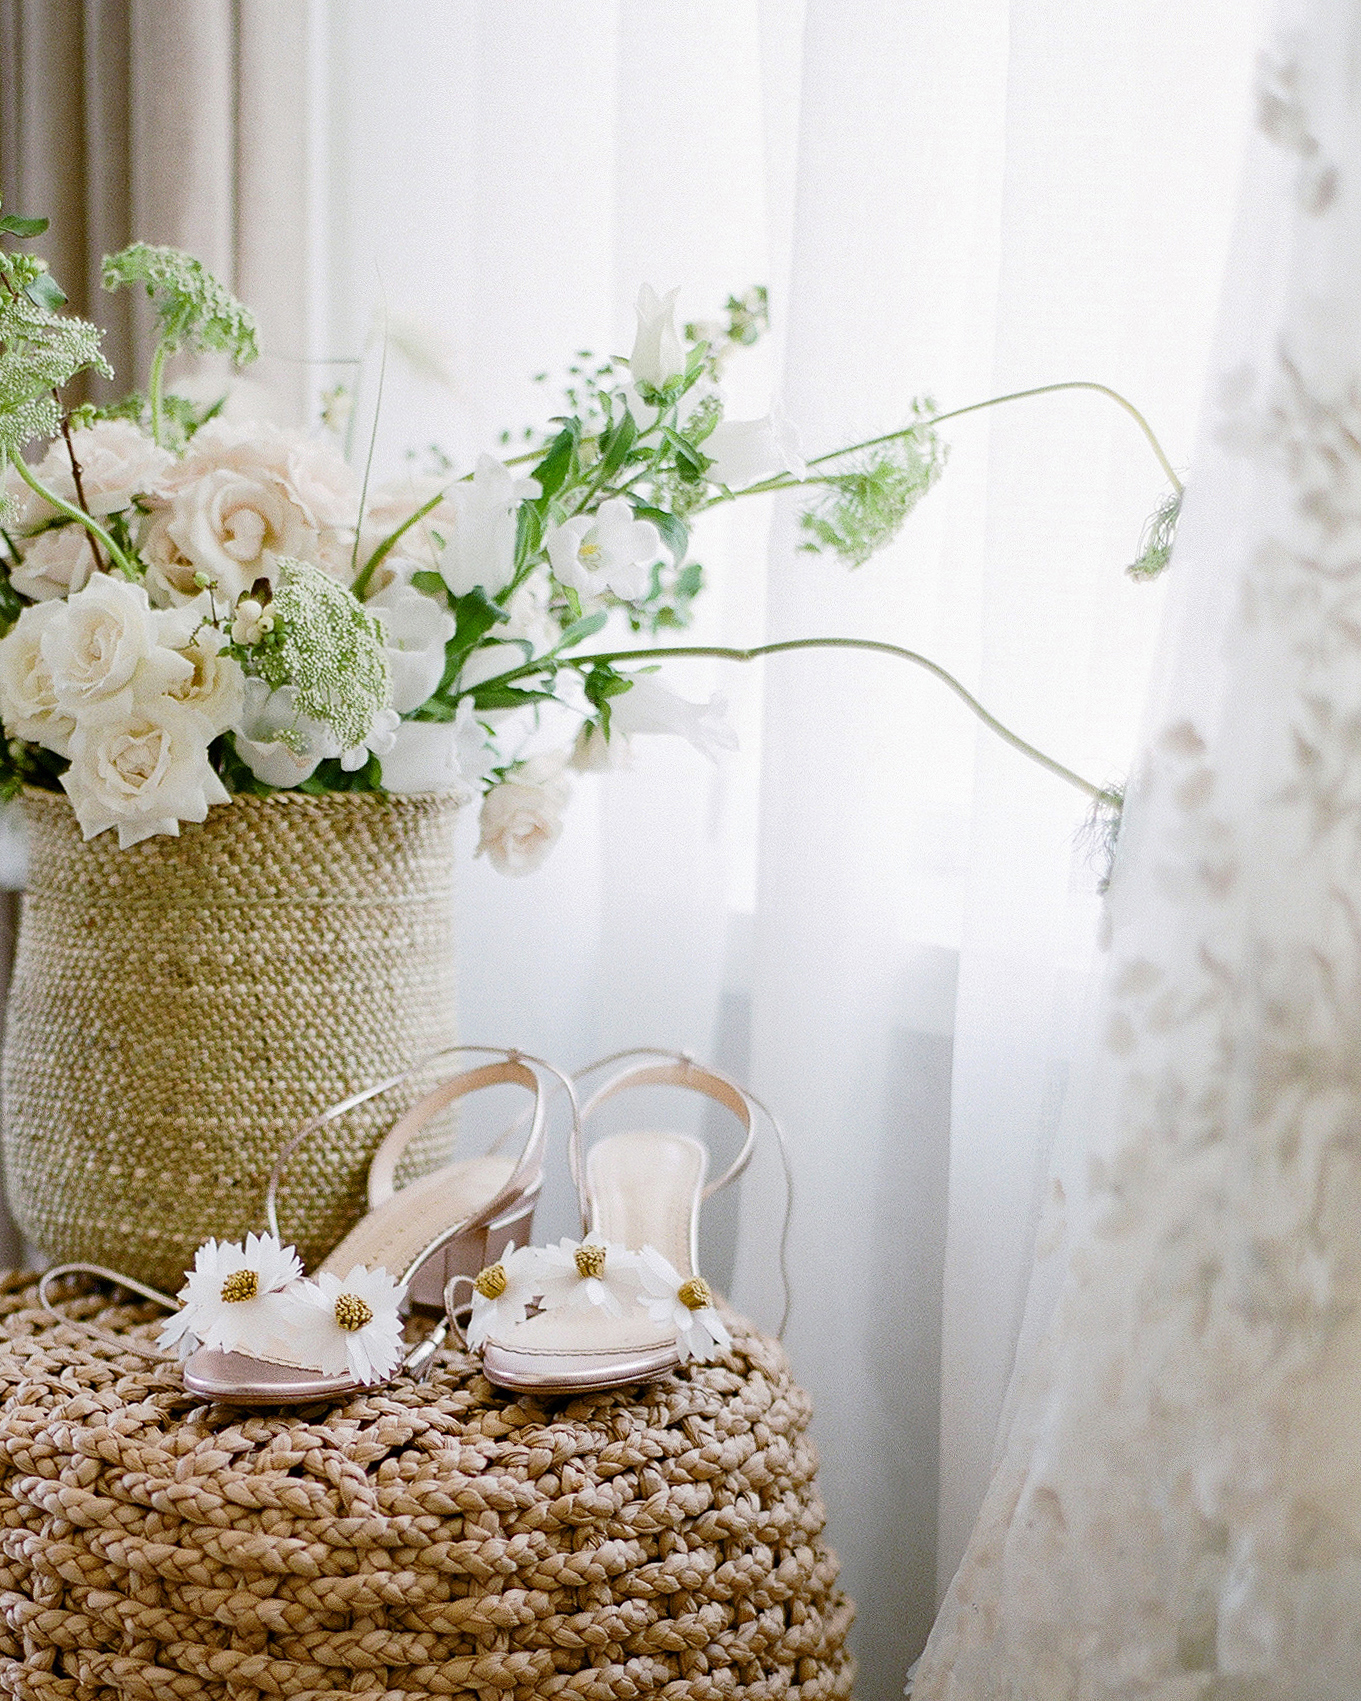 alex drew california wedding shoes and flower arrangement